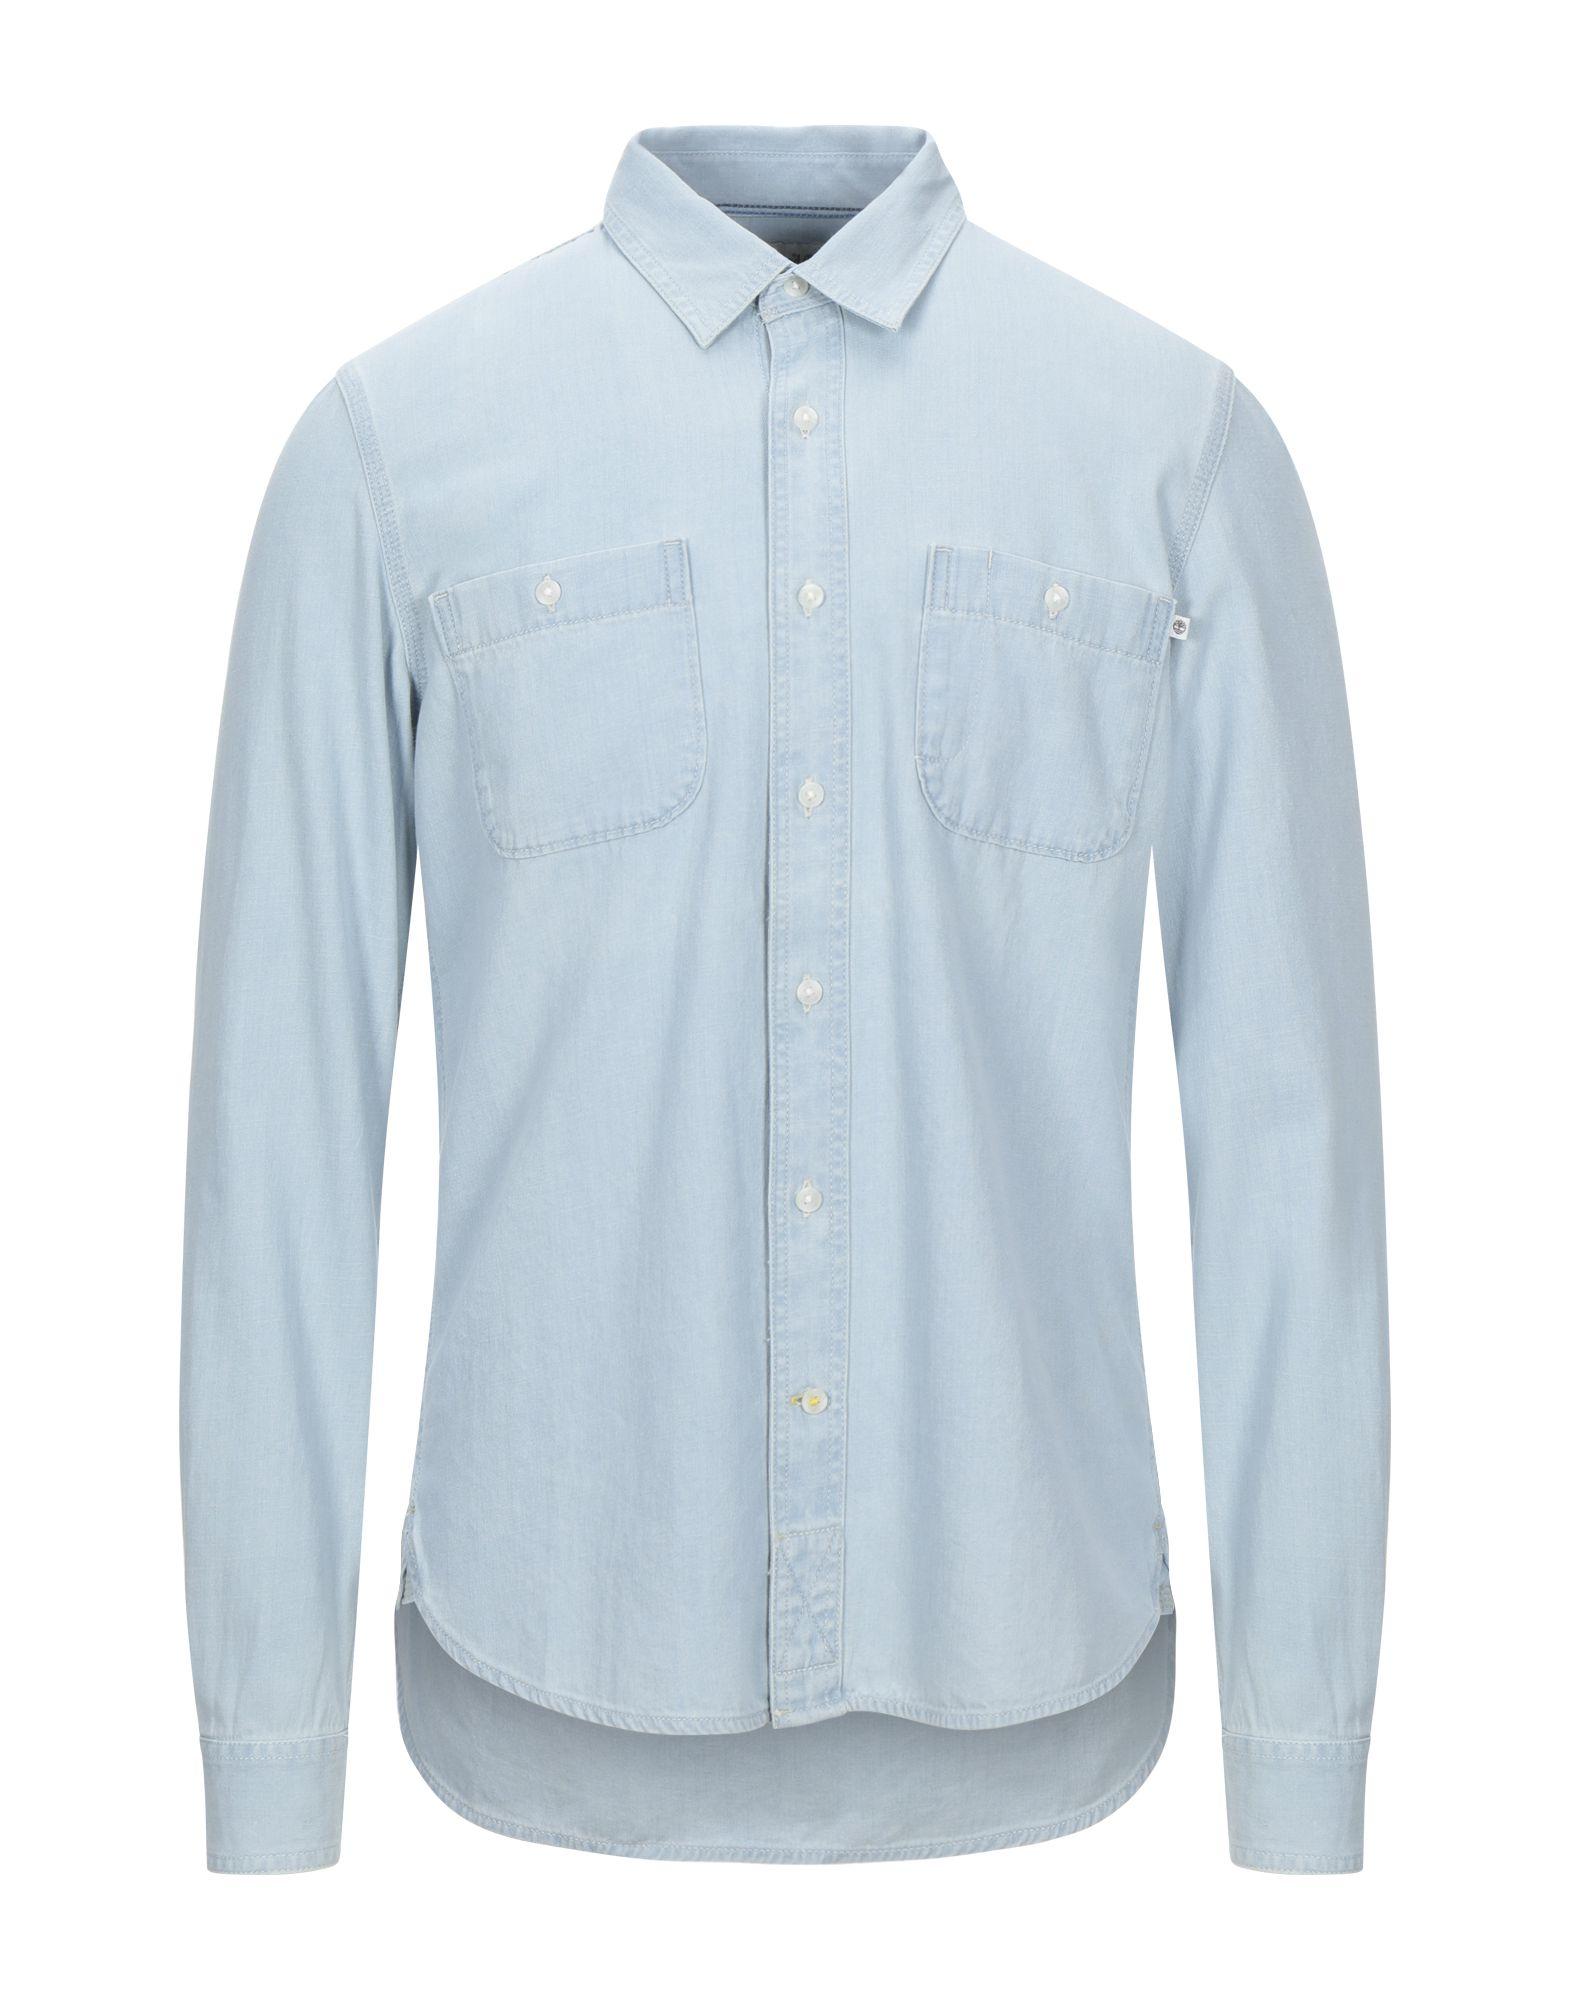 TIMBERLAND Denim shirts - Item 42815004